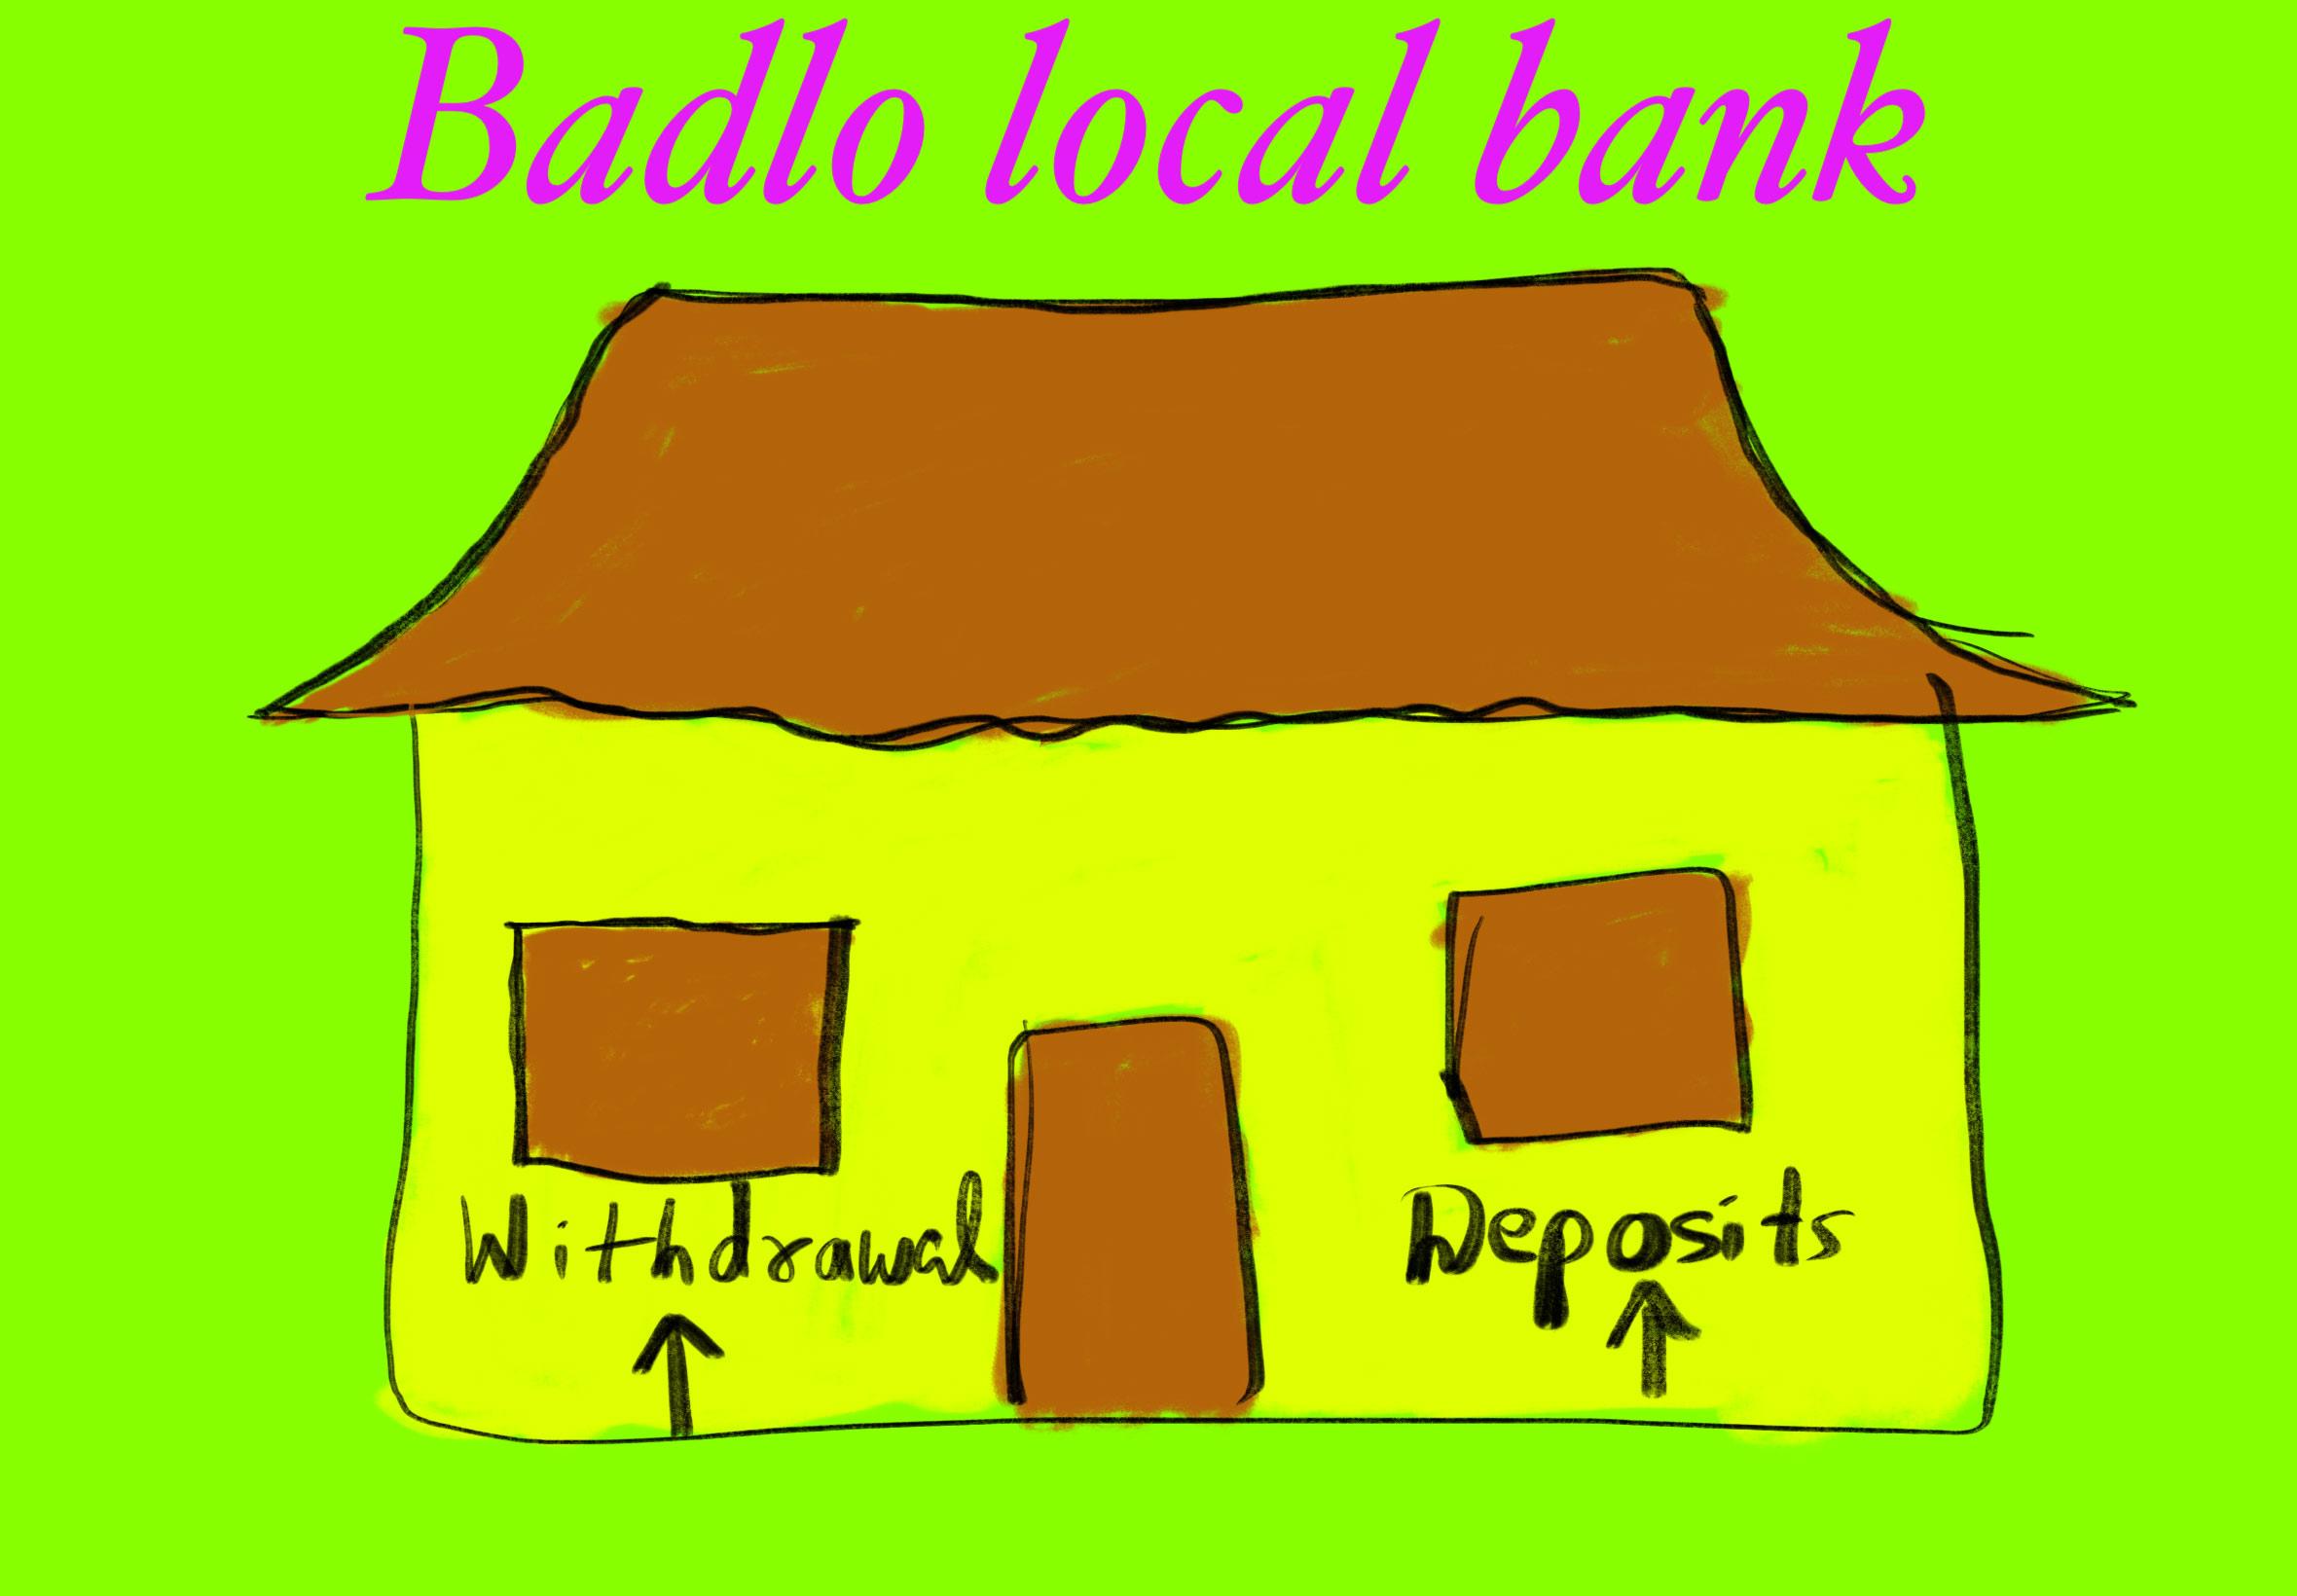 Badlo Local Bank Image